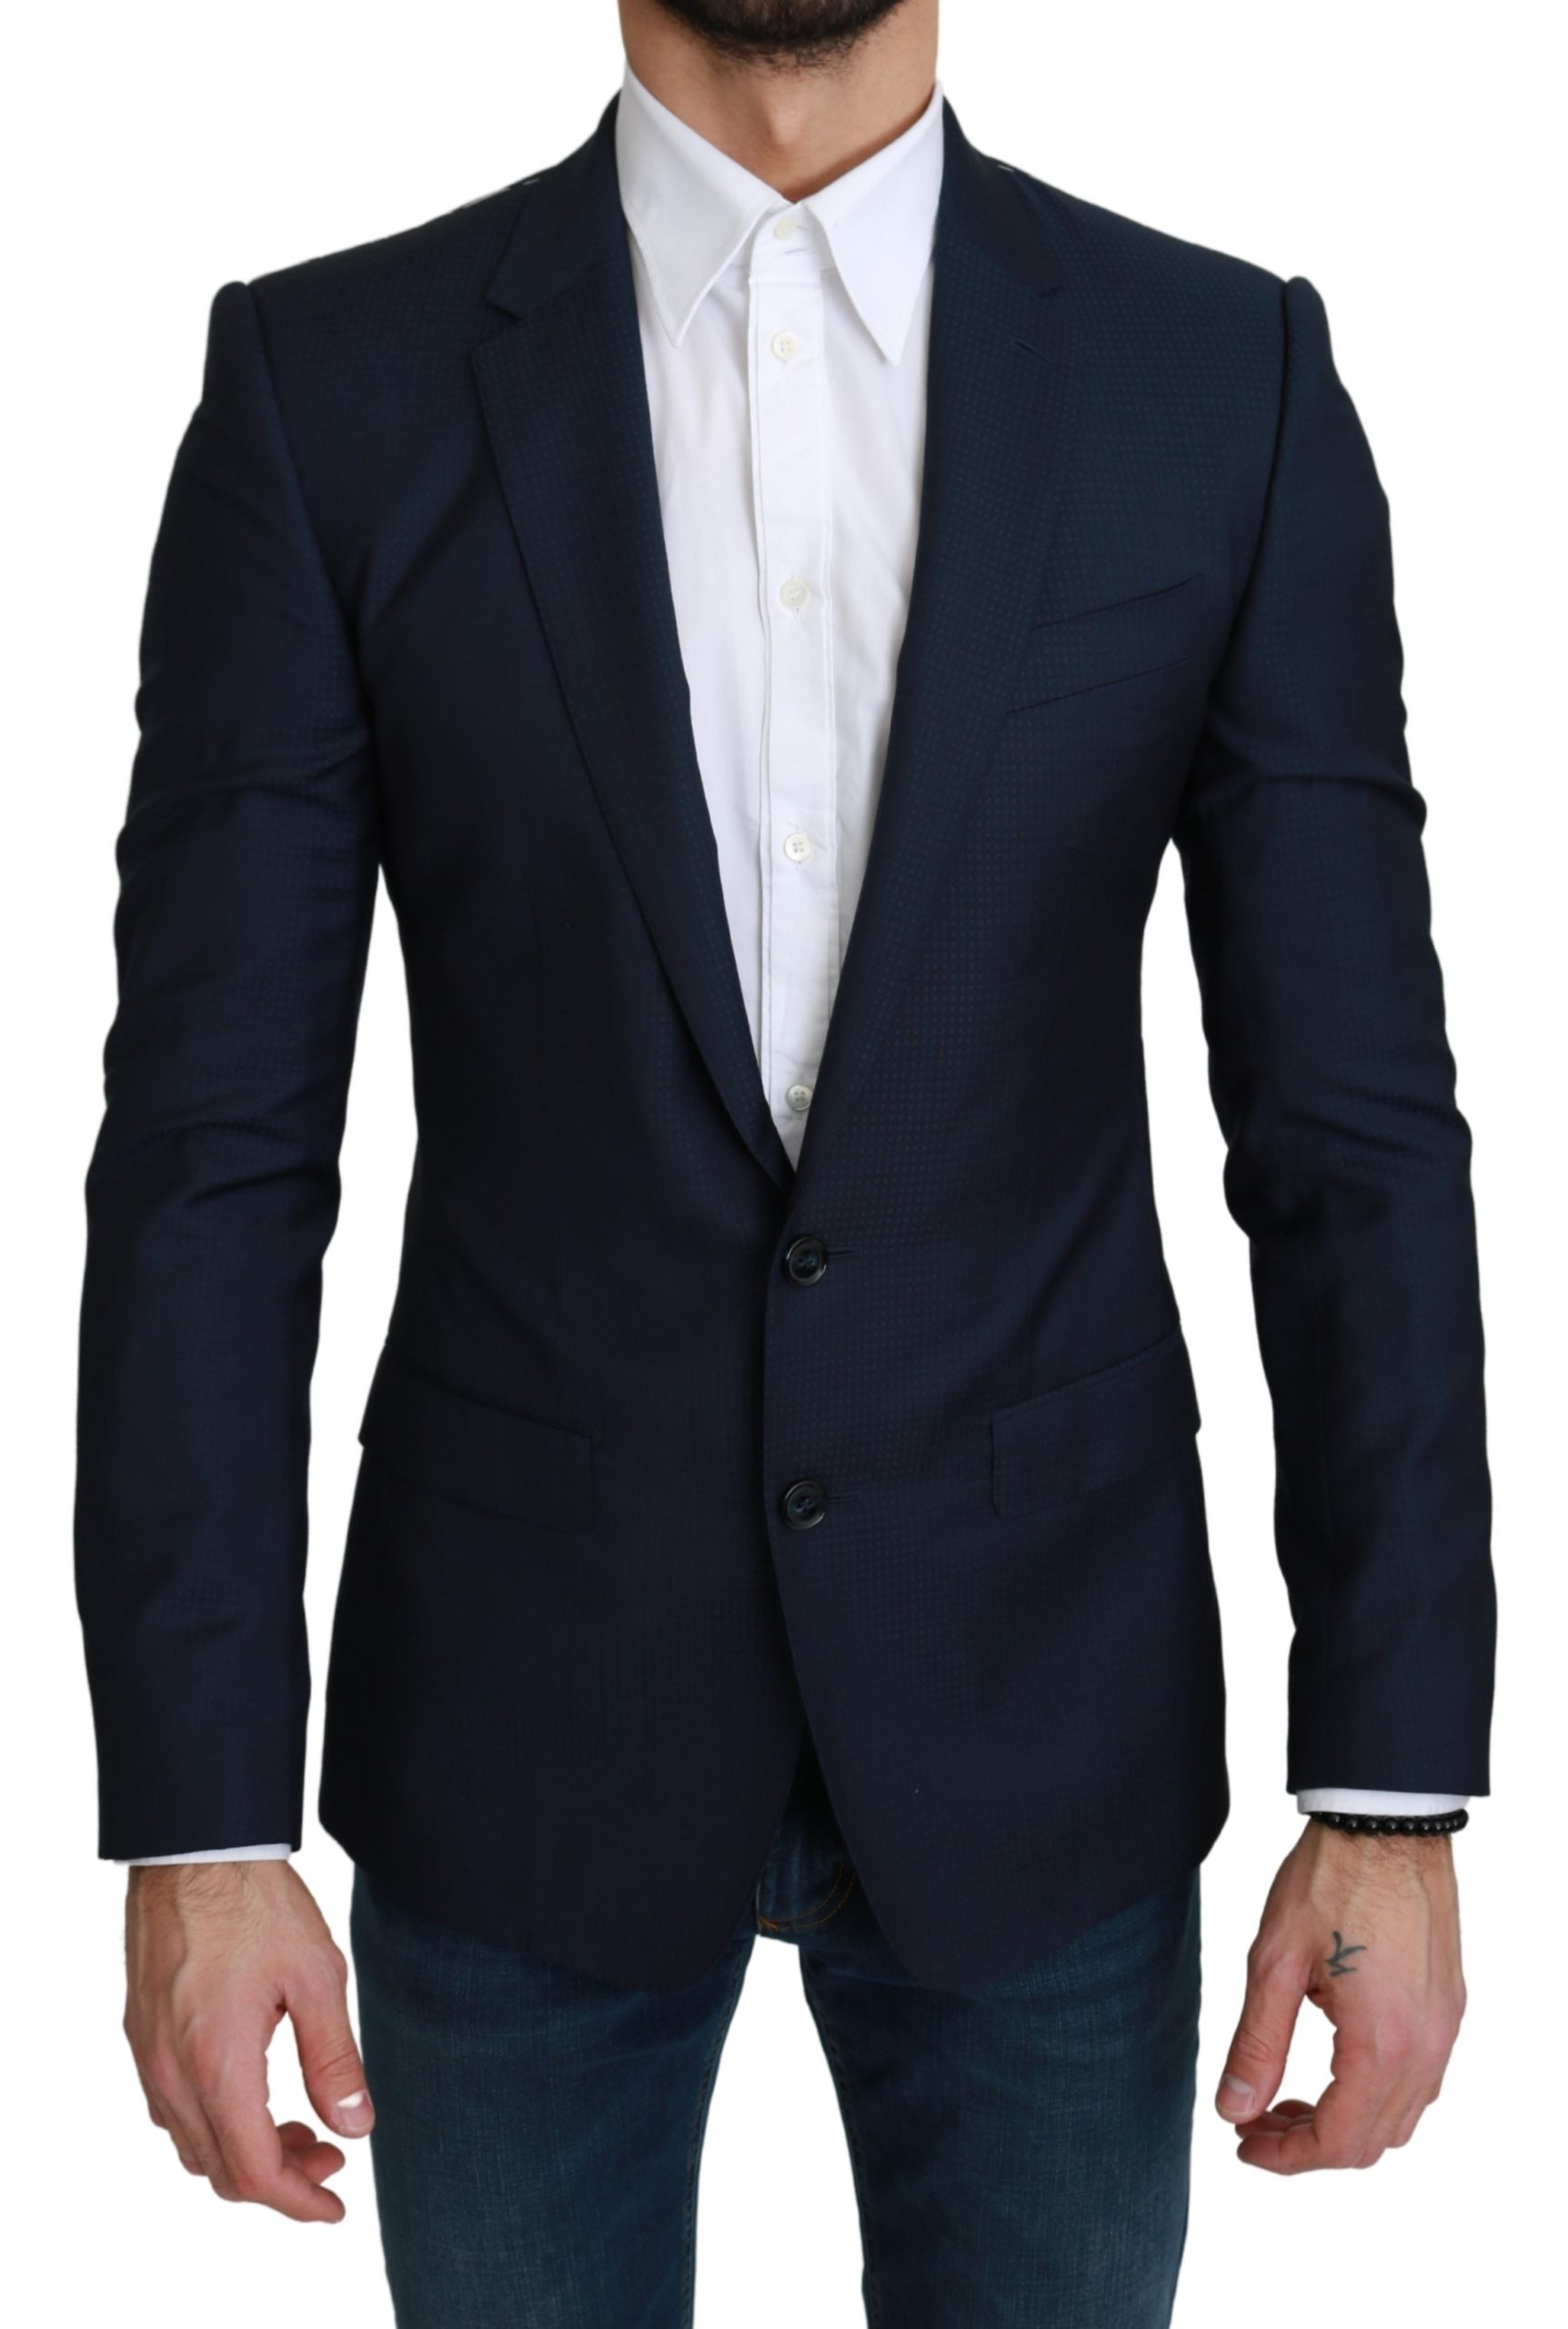 Dolce & Gabbana Men's Single Breasted MARTINI Blazer Navy Blue KOS1746 - IT44 | XS